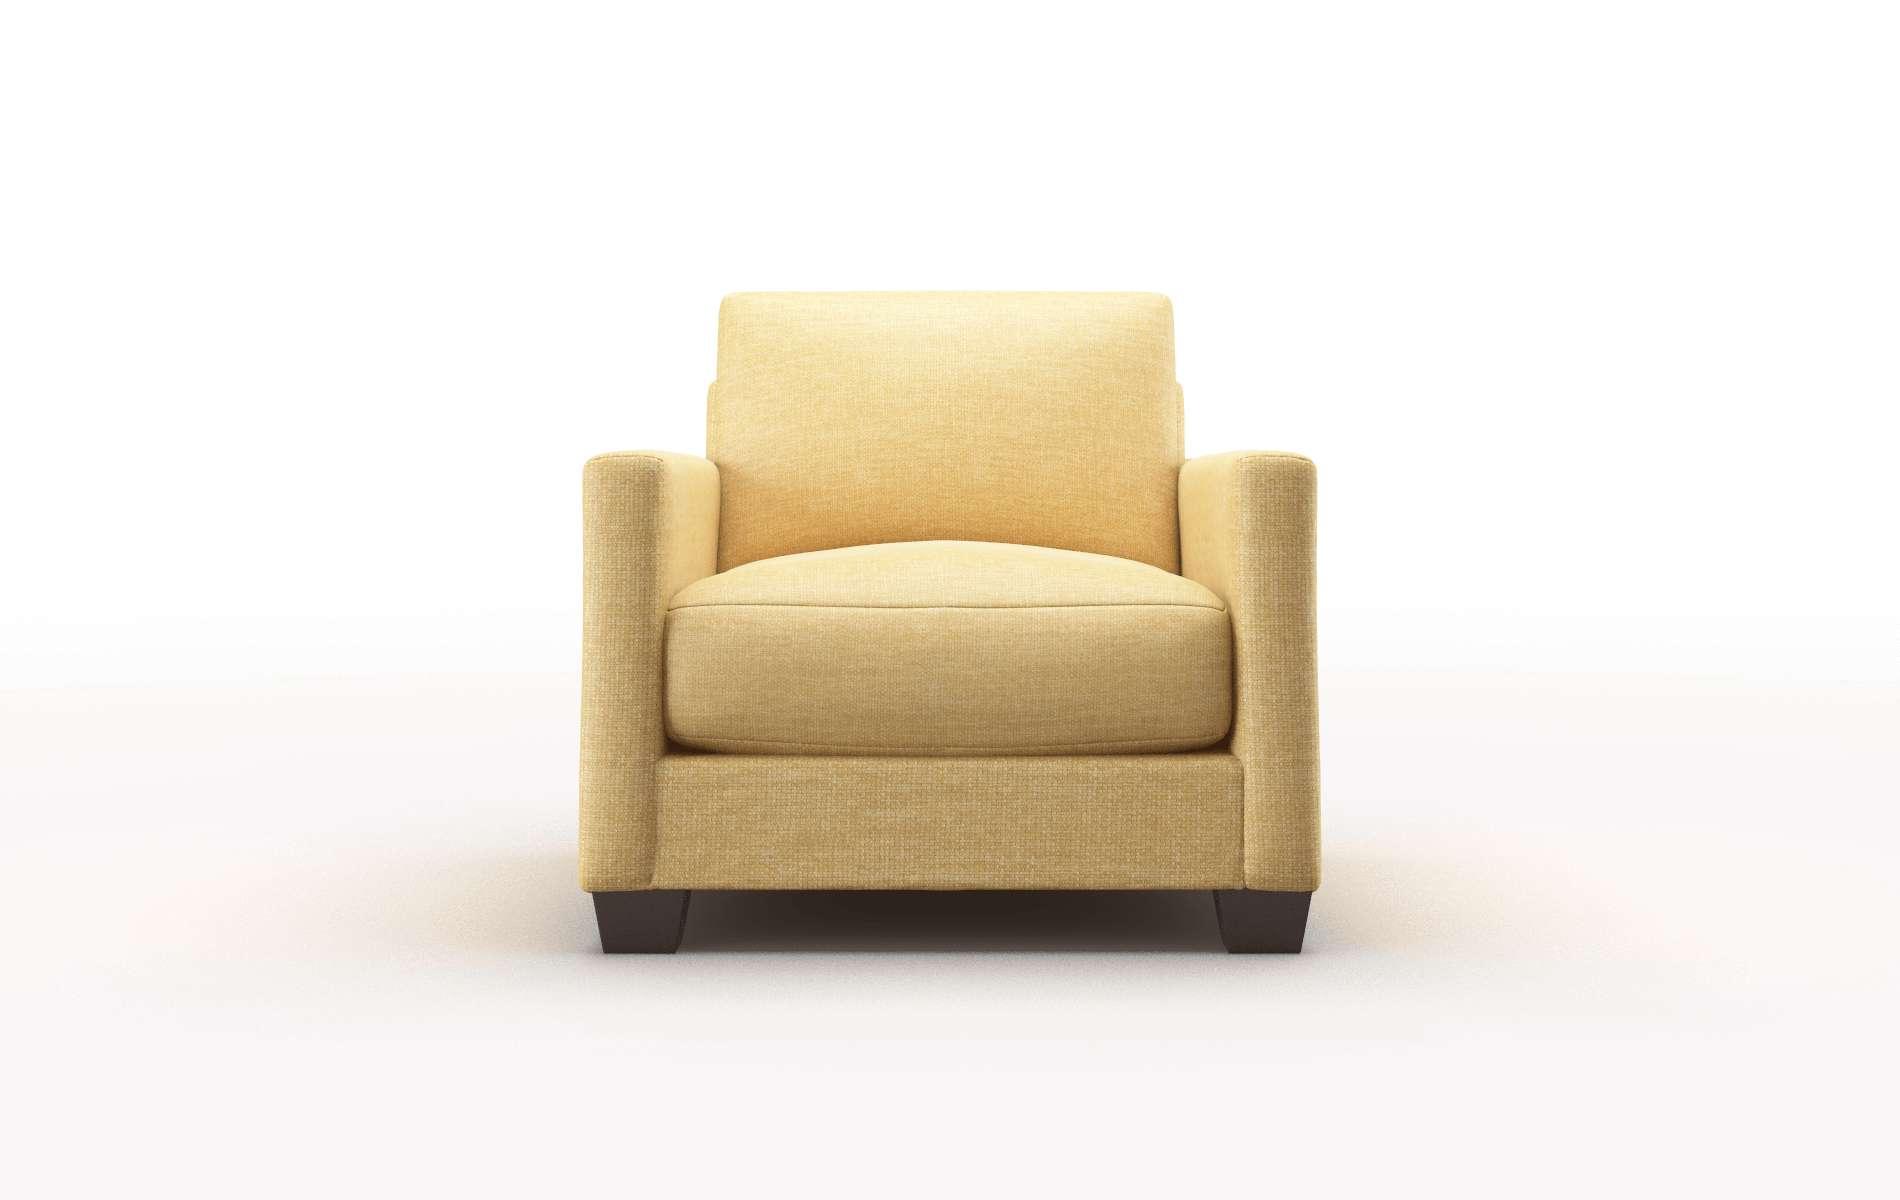 Dresden Keylargo Honey chair espresso legs